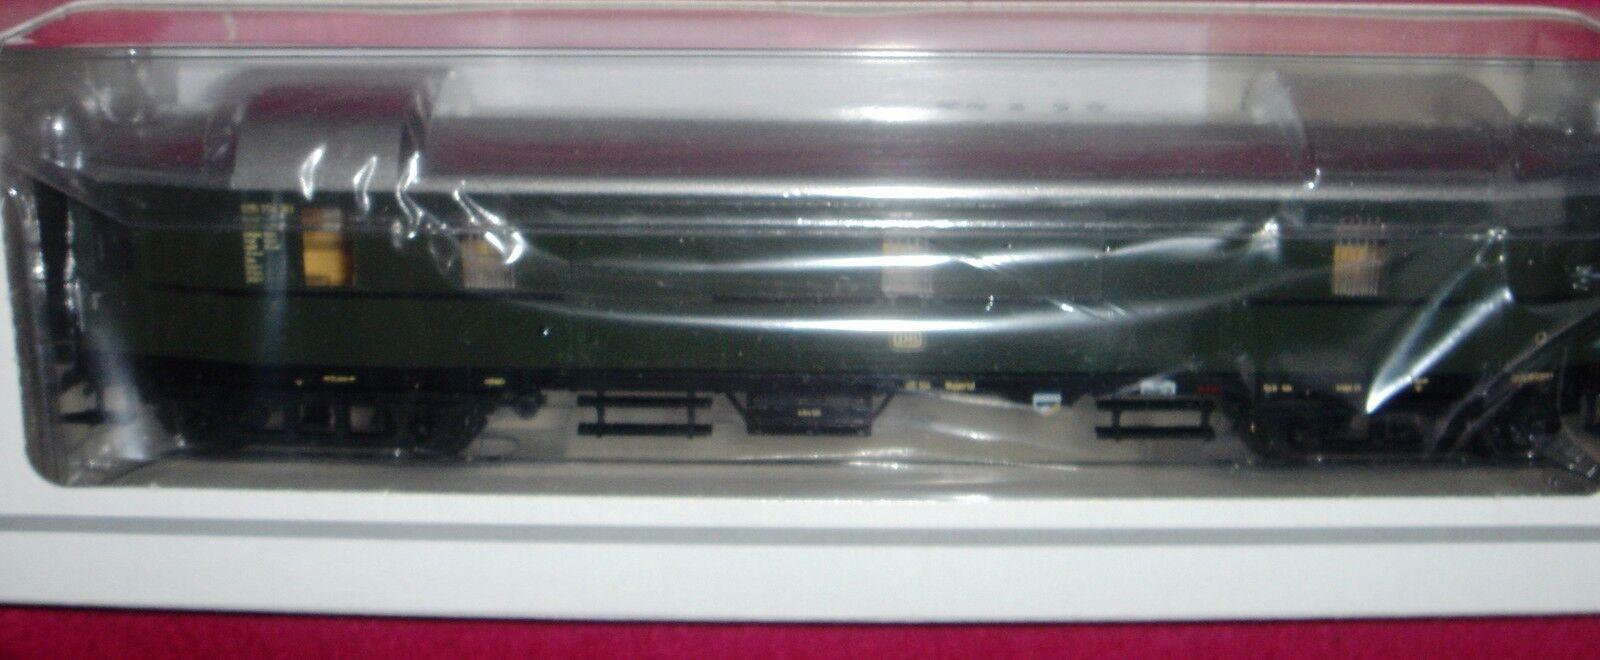 42260 treno rapido carrello Borsaagli * Hecht * EPOCA III-HO-NUOVO